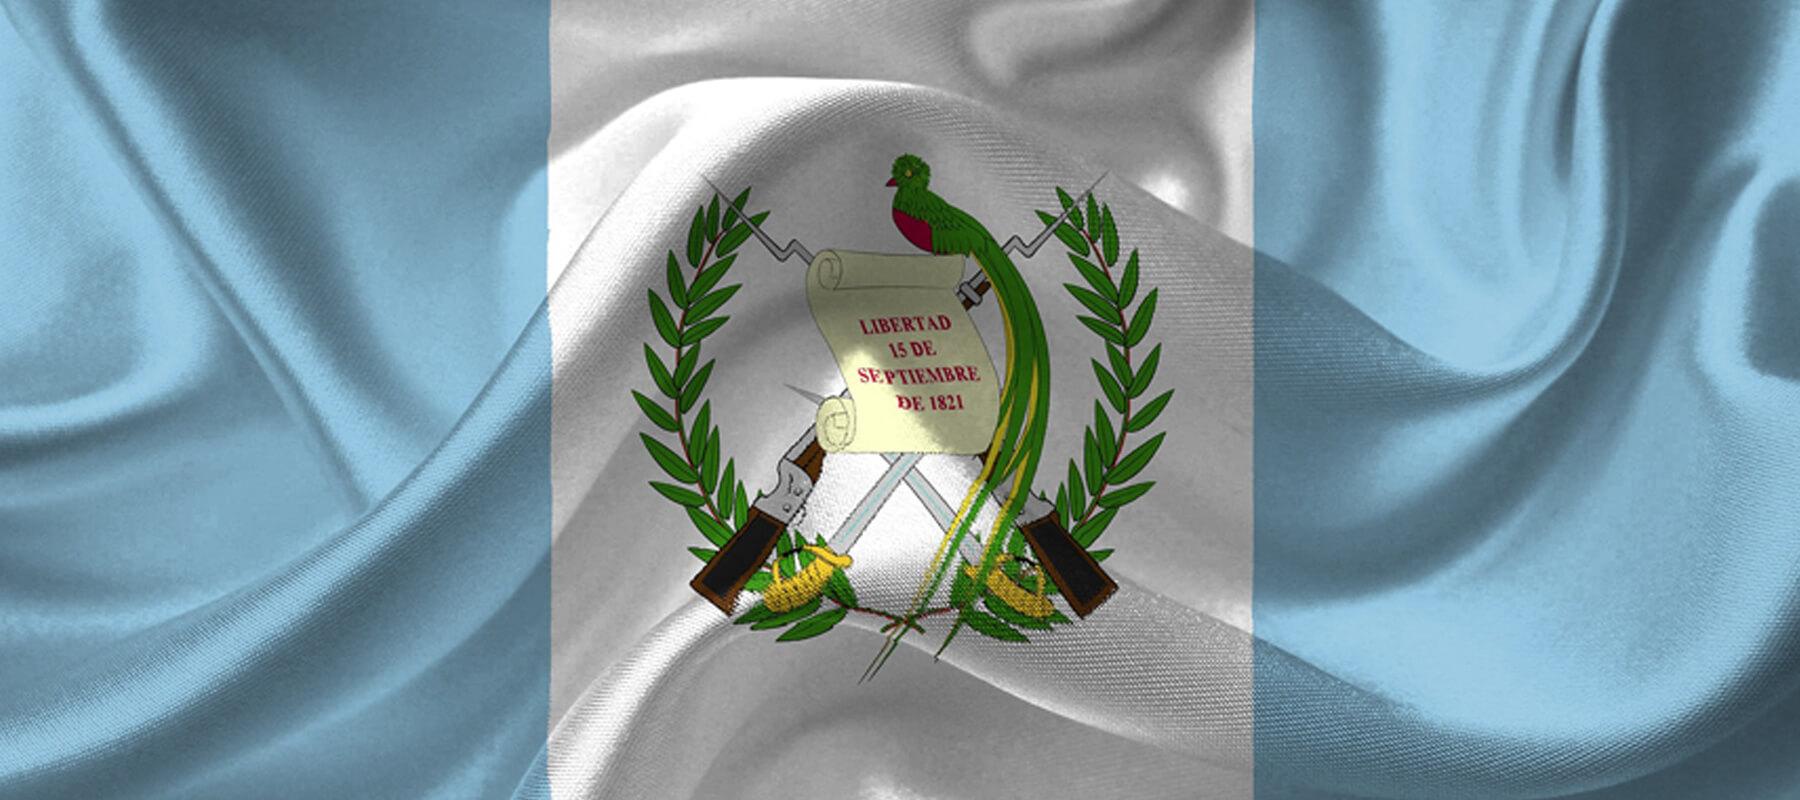 Guatemala, tu me reverras